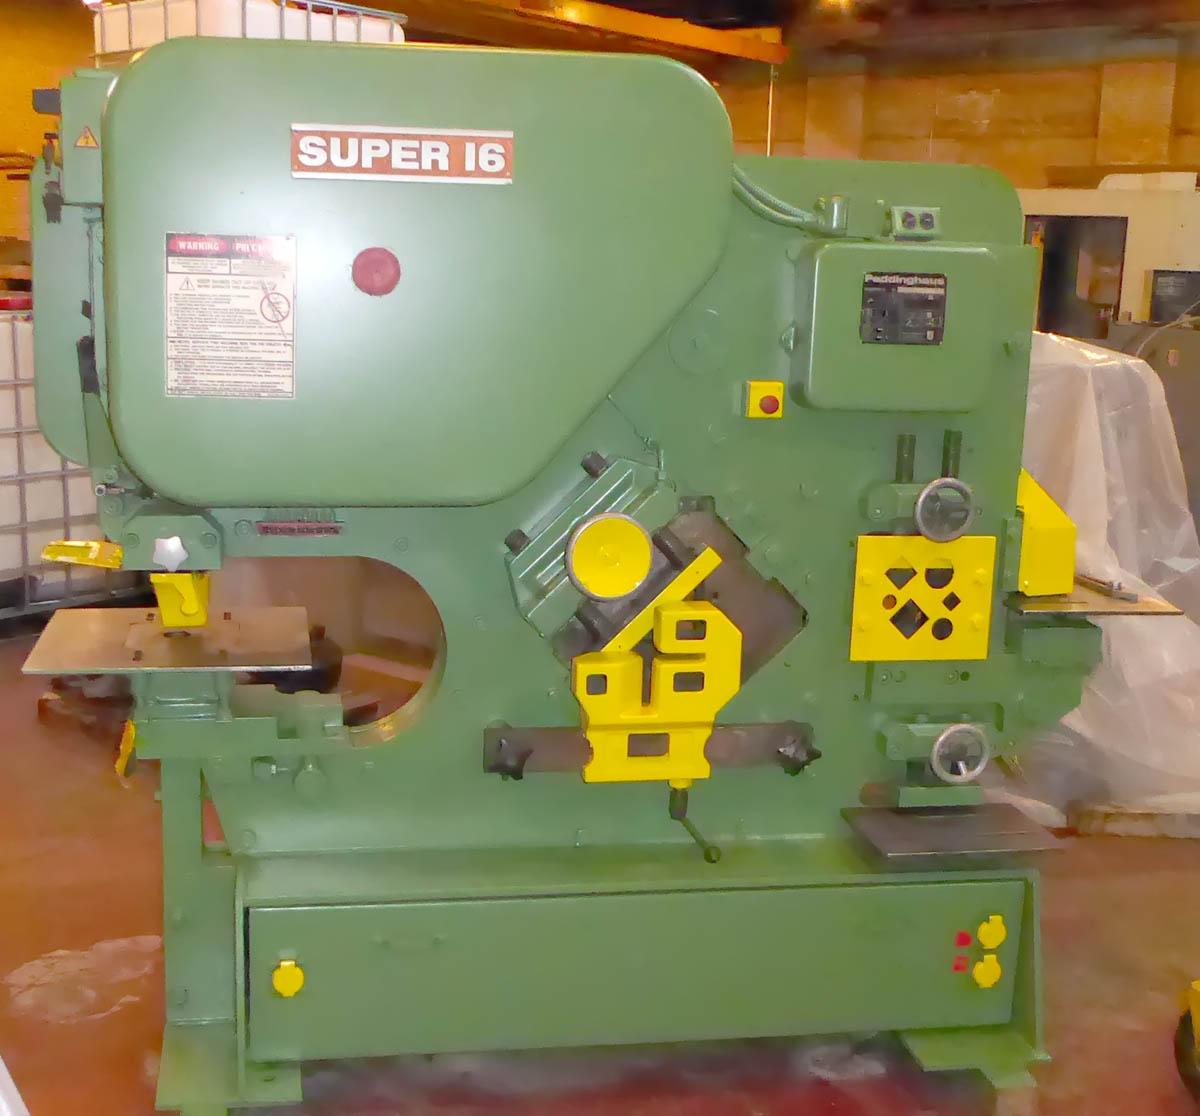 Peddinghaus 210 Super 16, 88 Ton Mechanical Iron Worker